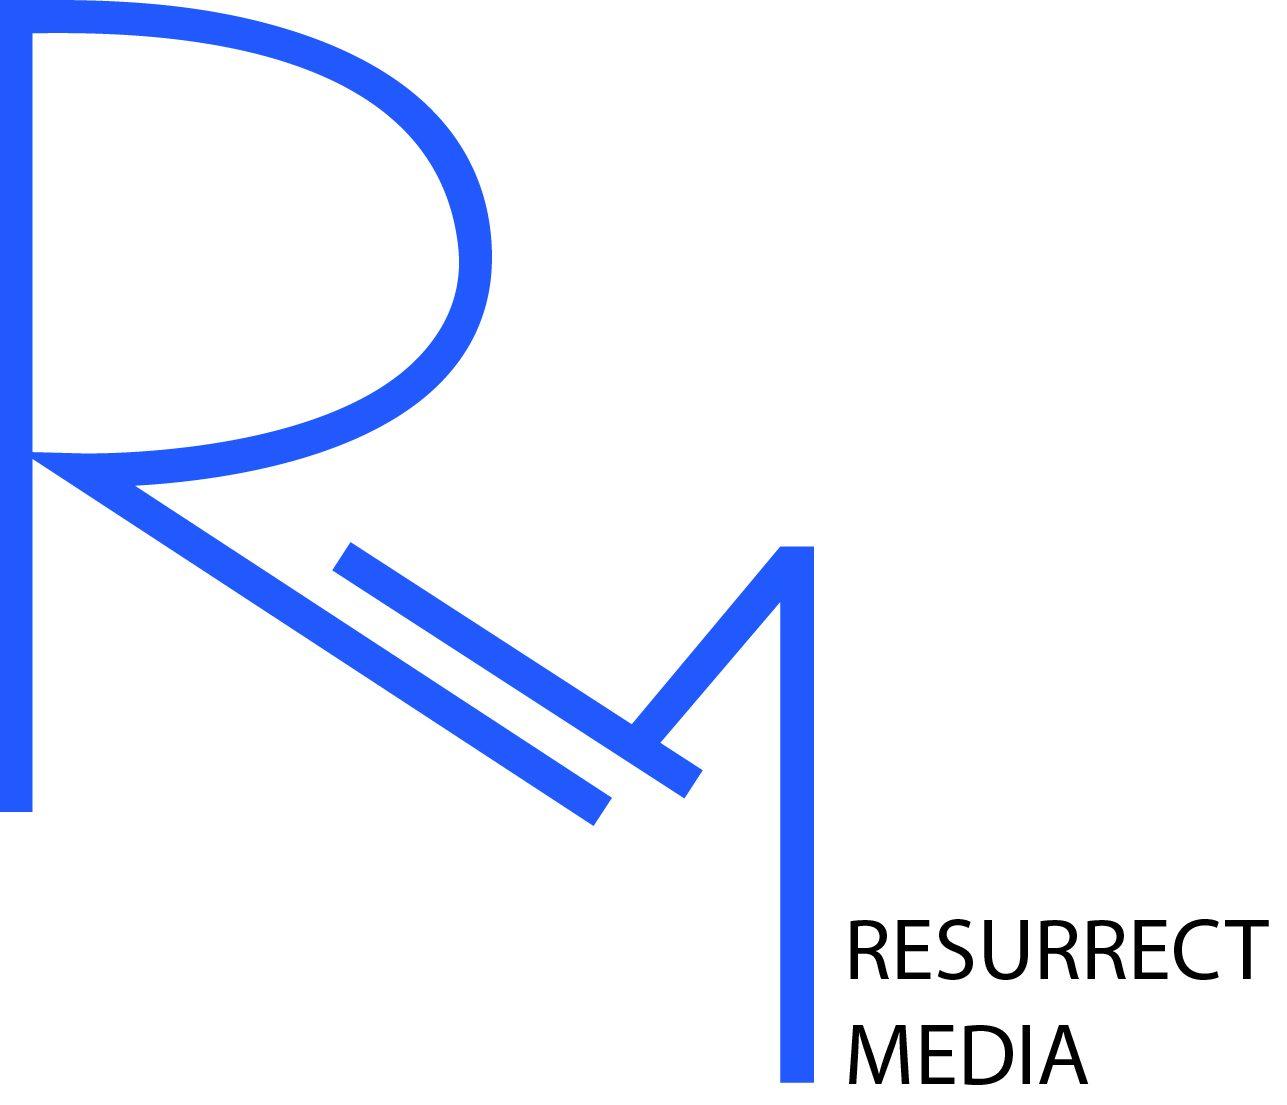 Resurrect Media